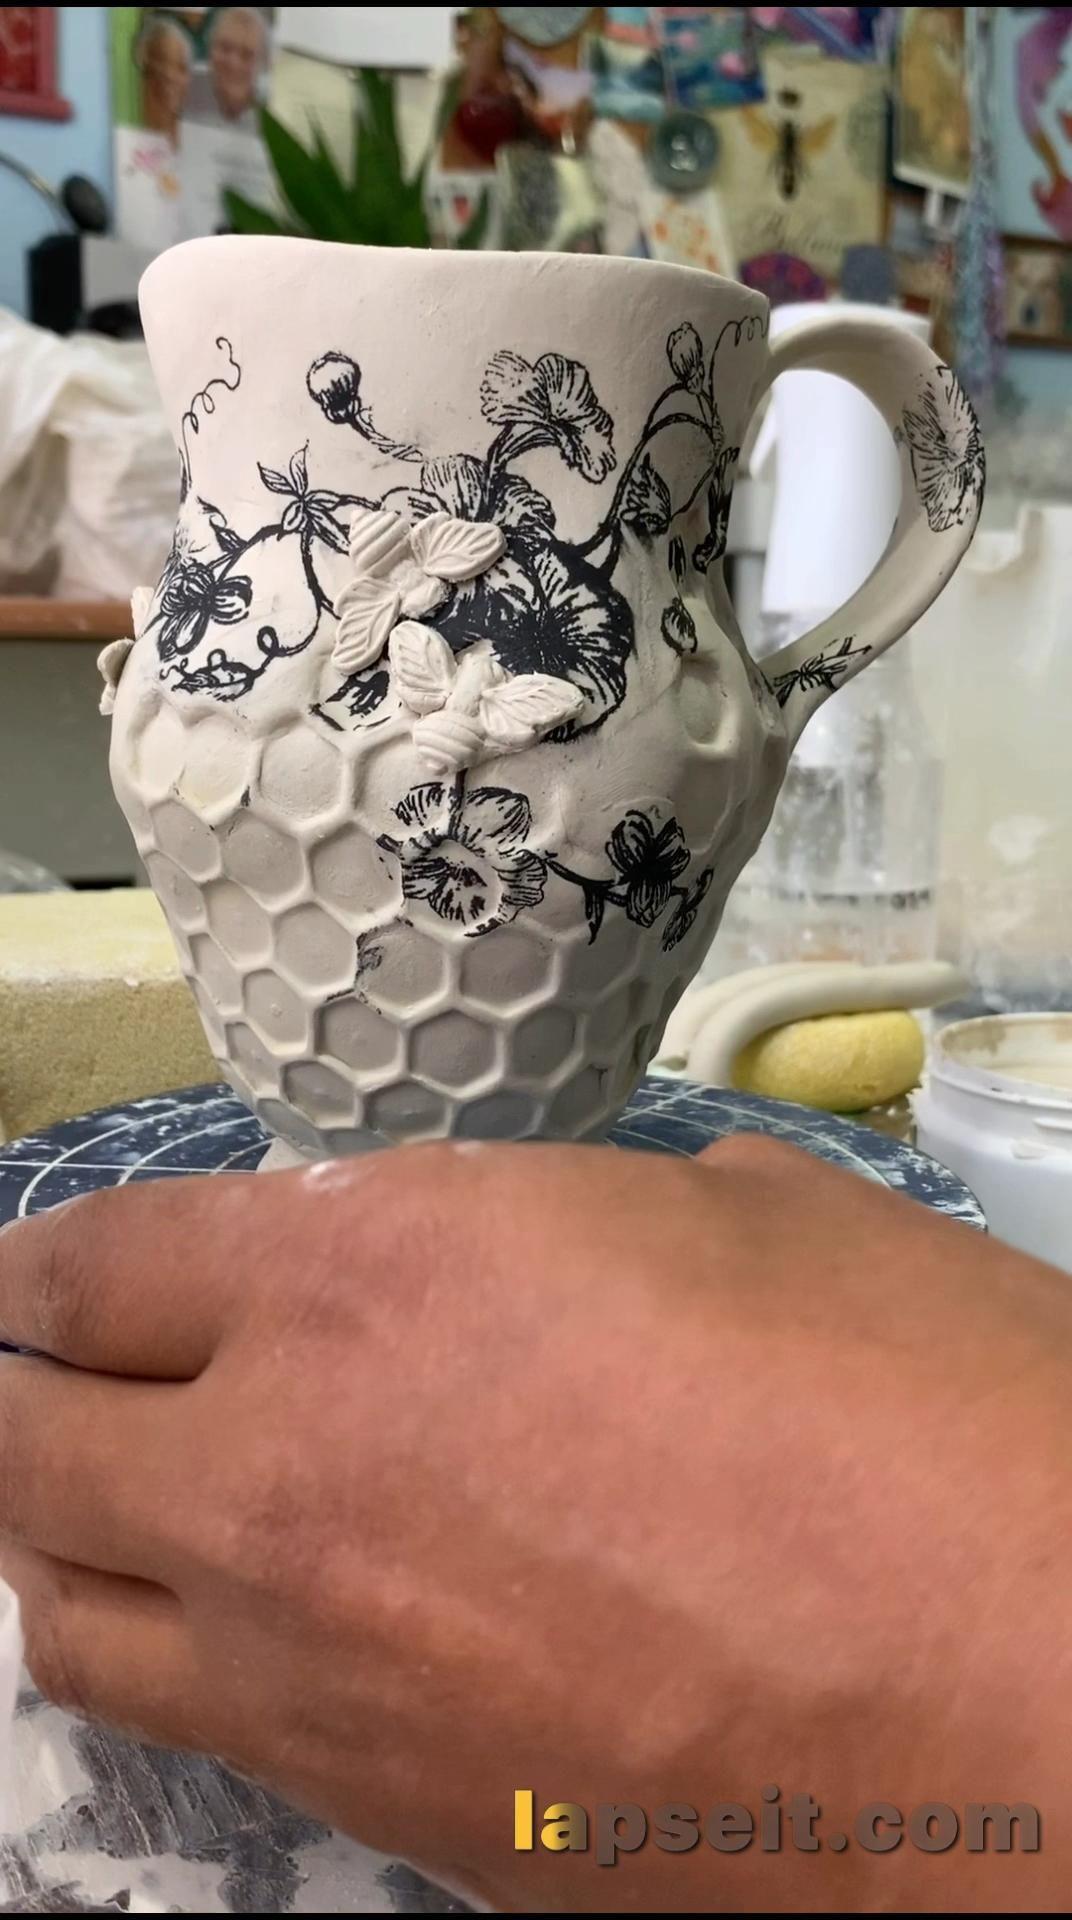 Honeycomb beehive in a flower garden mug.